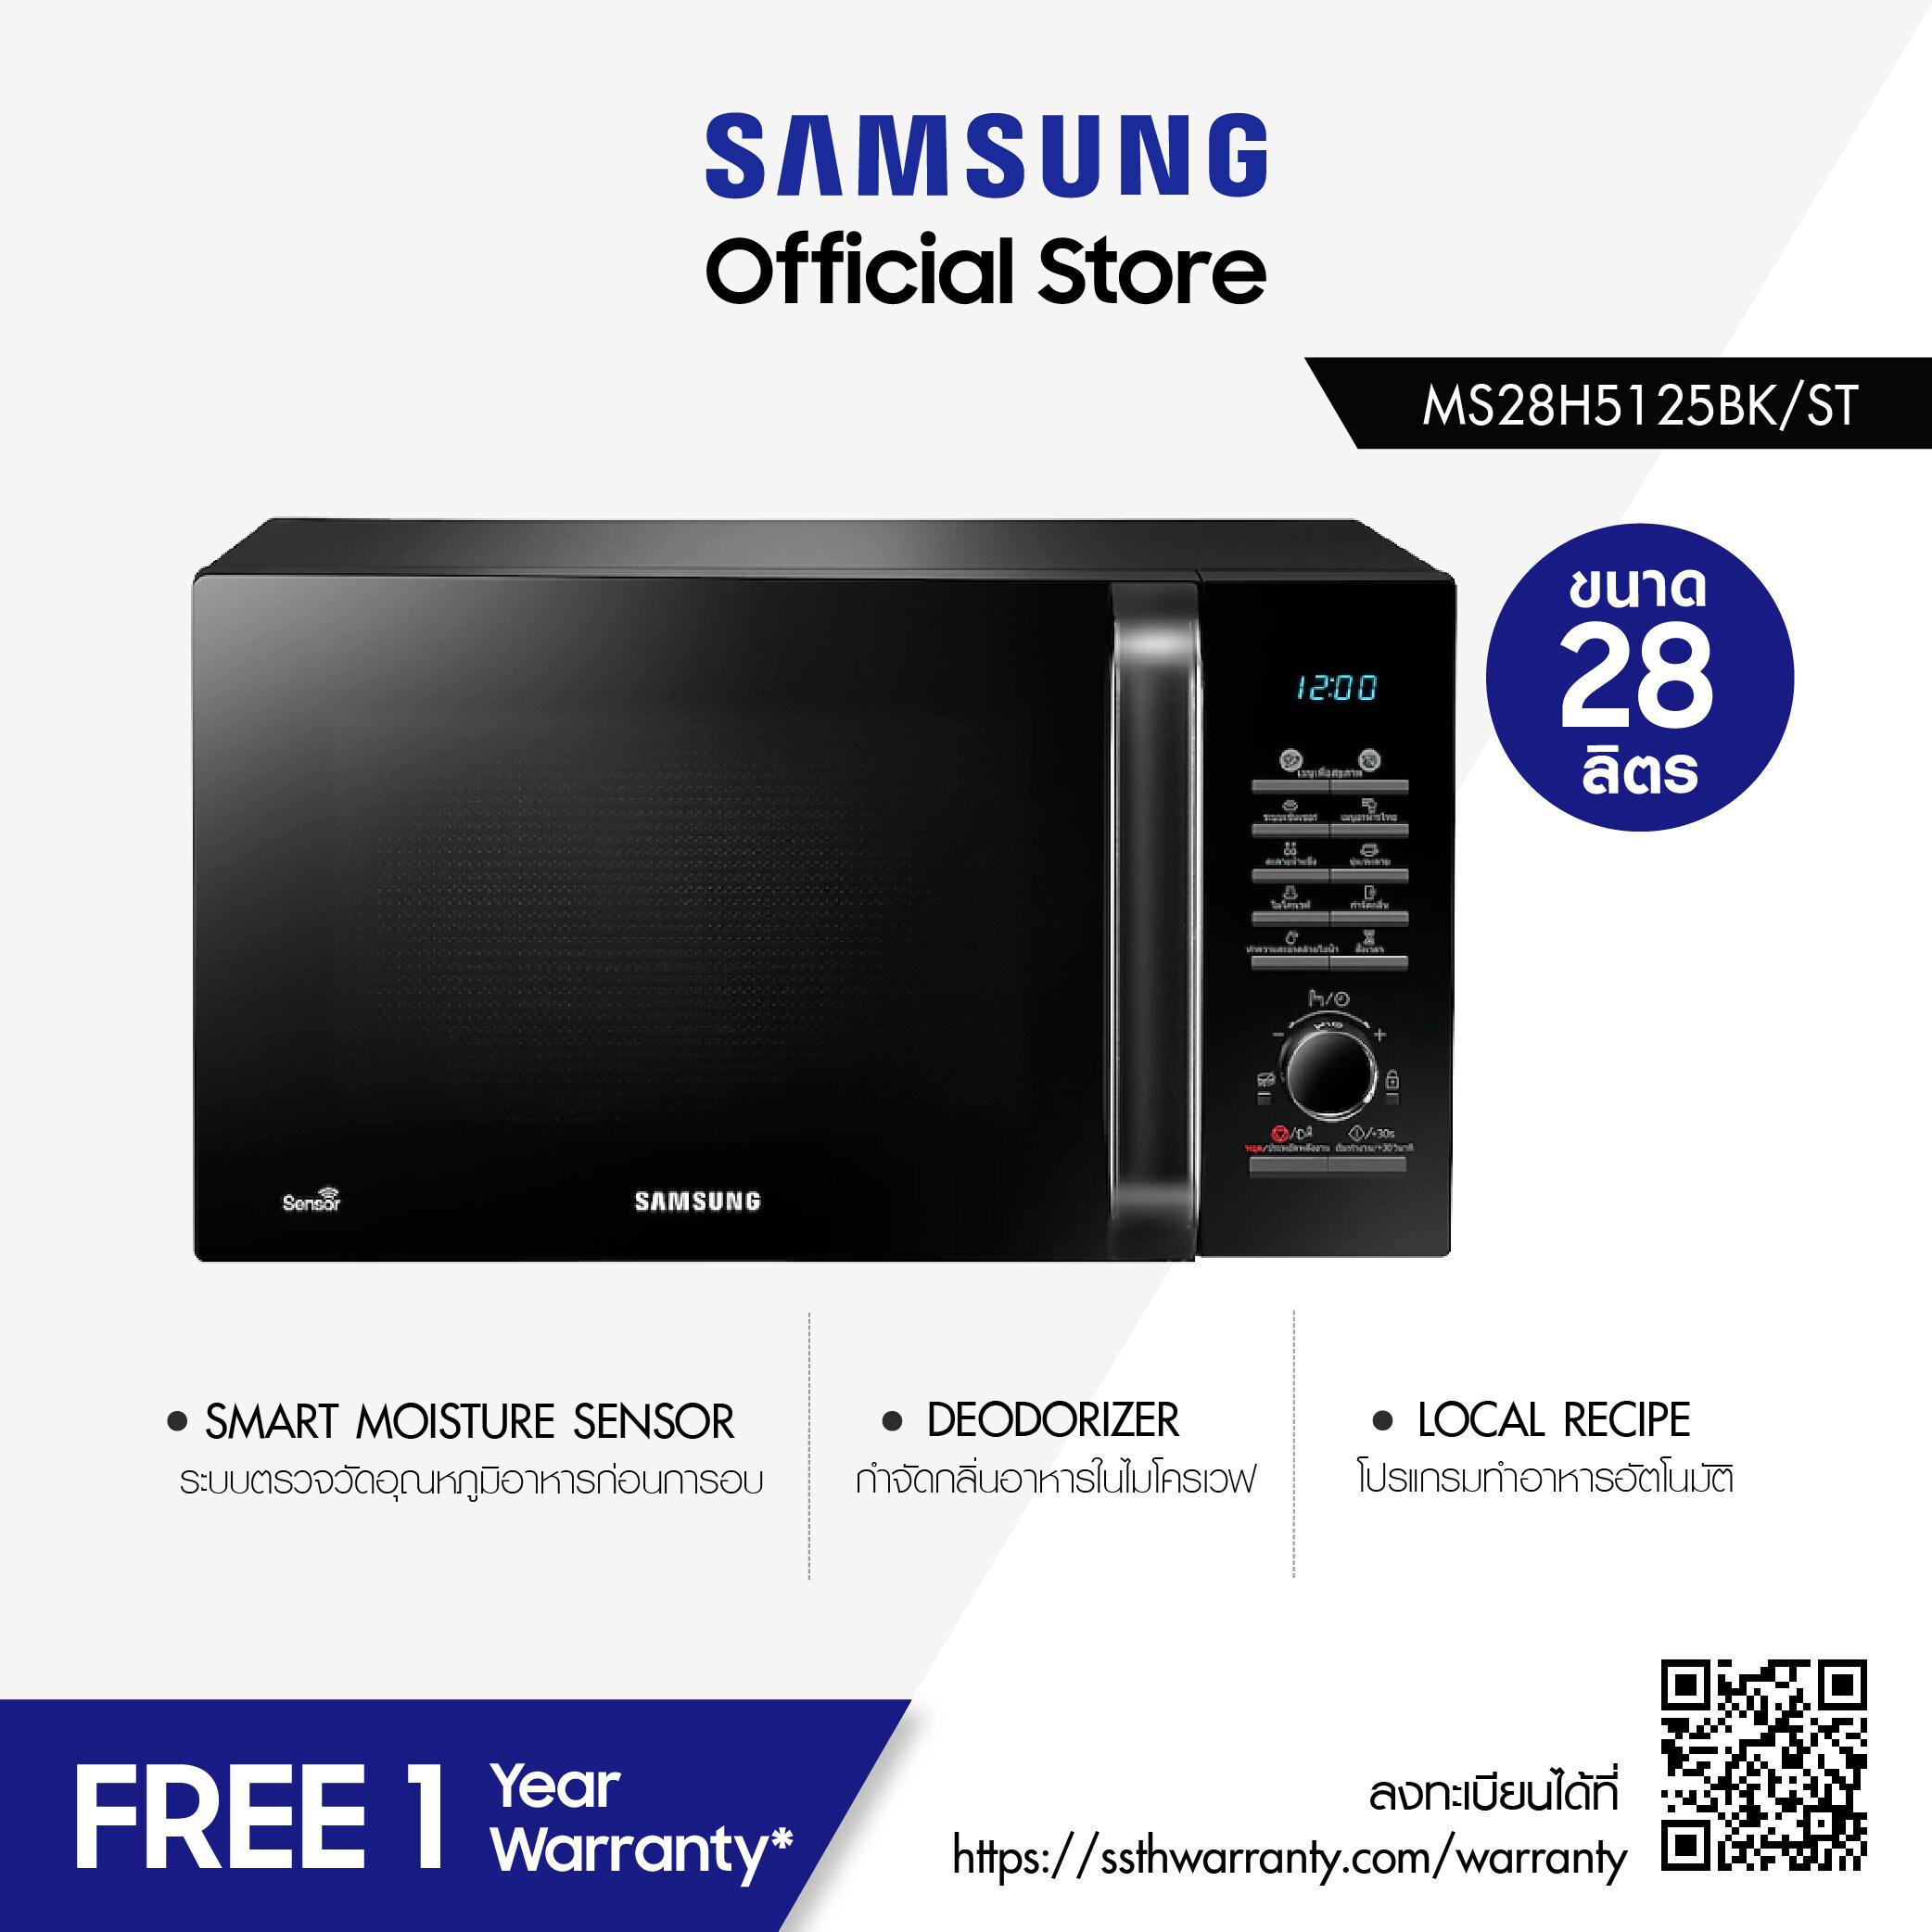 Samsung เตาอบไมโครเวฟ อุ่นอาหาร รุ่น MS28H5125BK/ST ความจุ 28 ลิตร